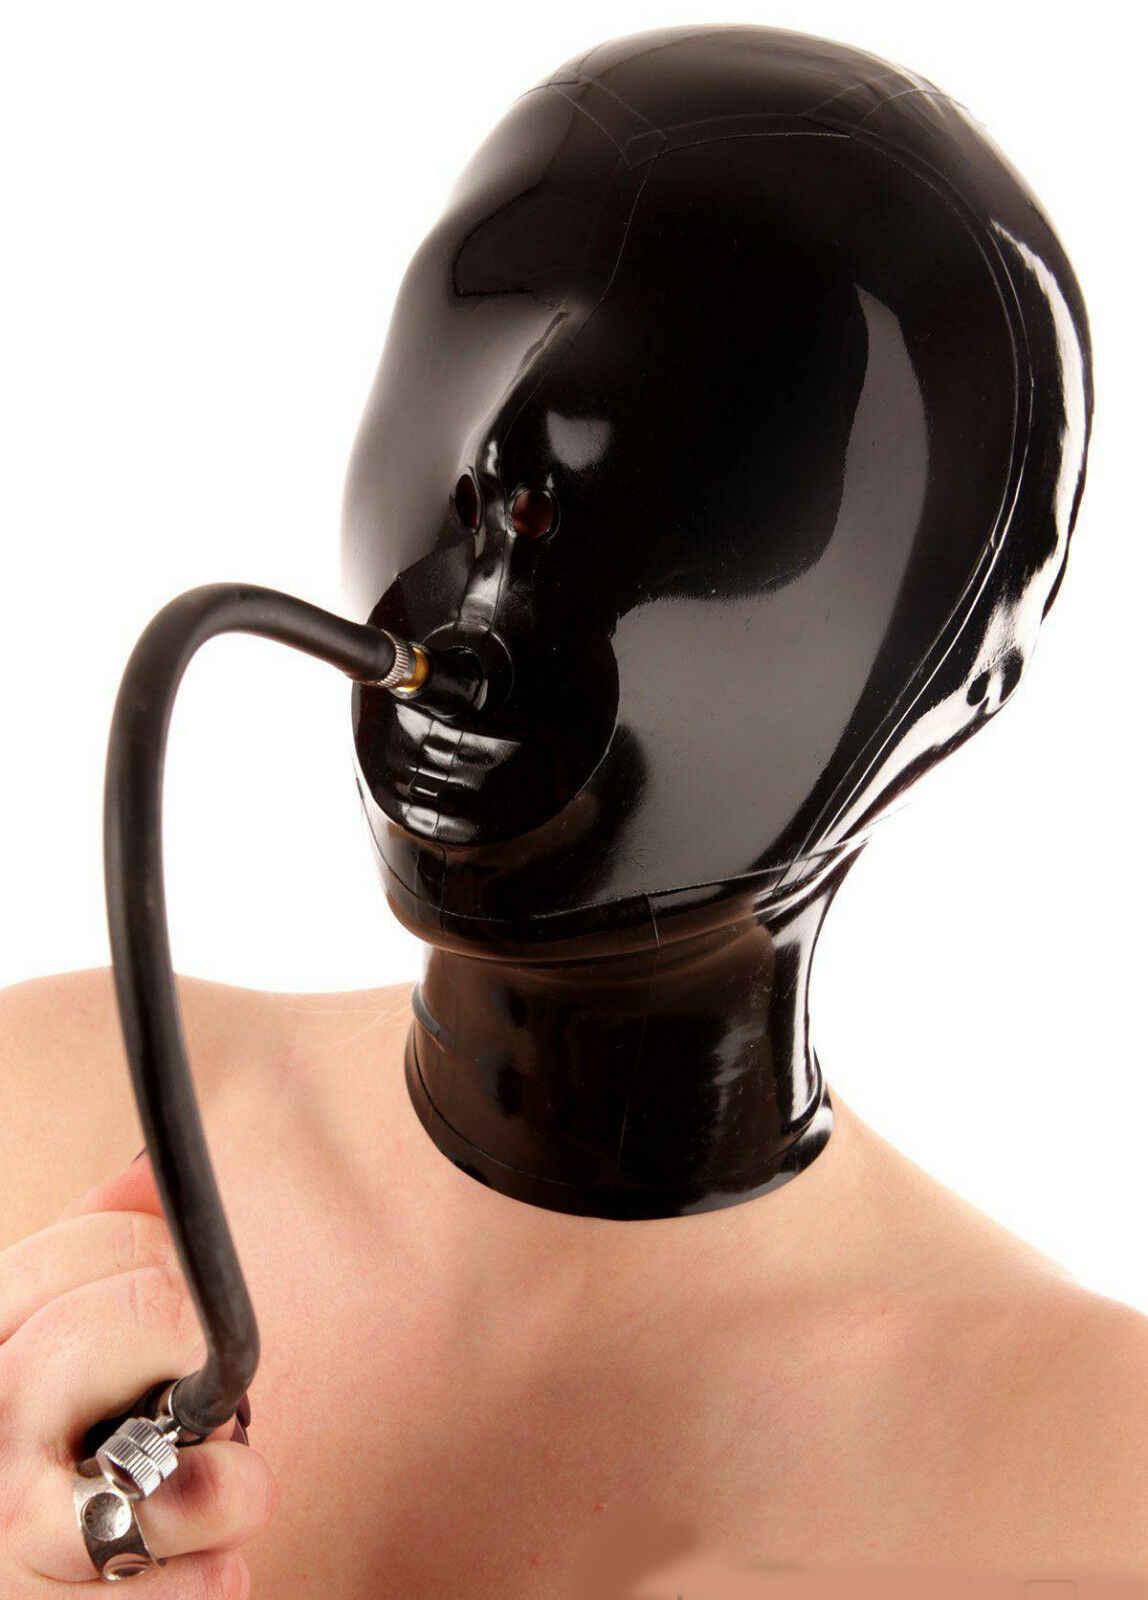 bondage masken, leder und gummi latex